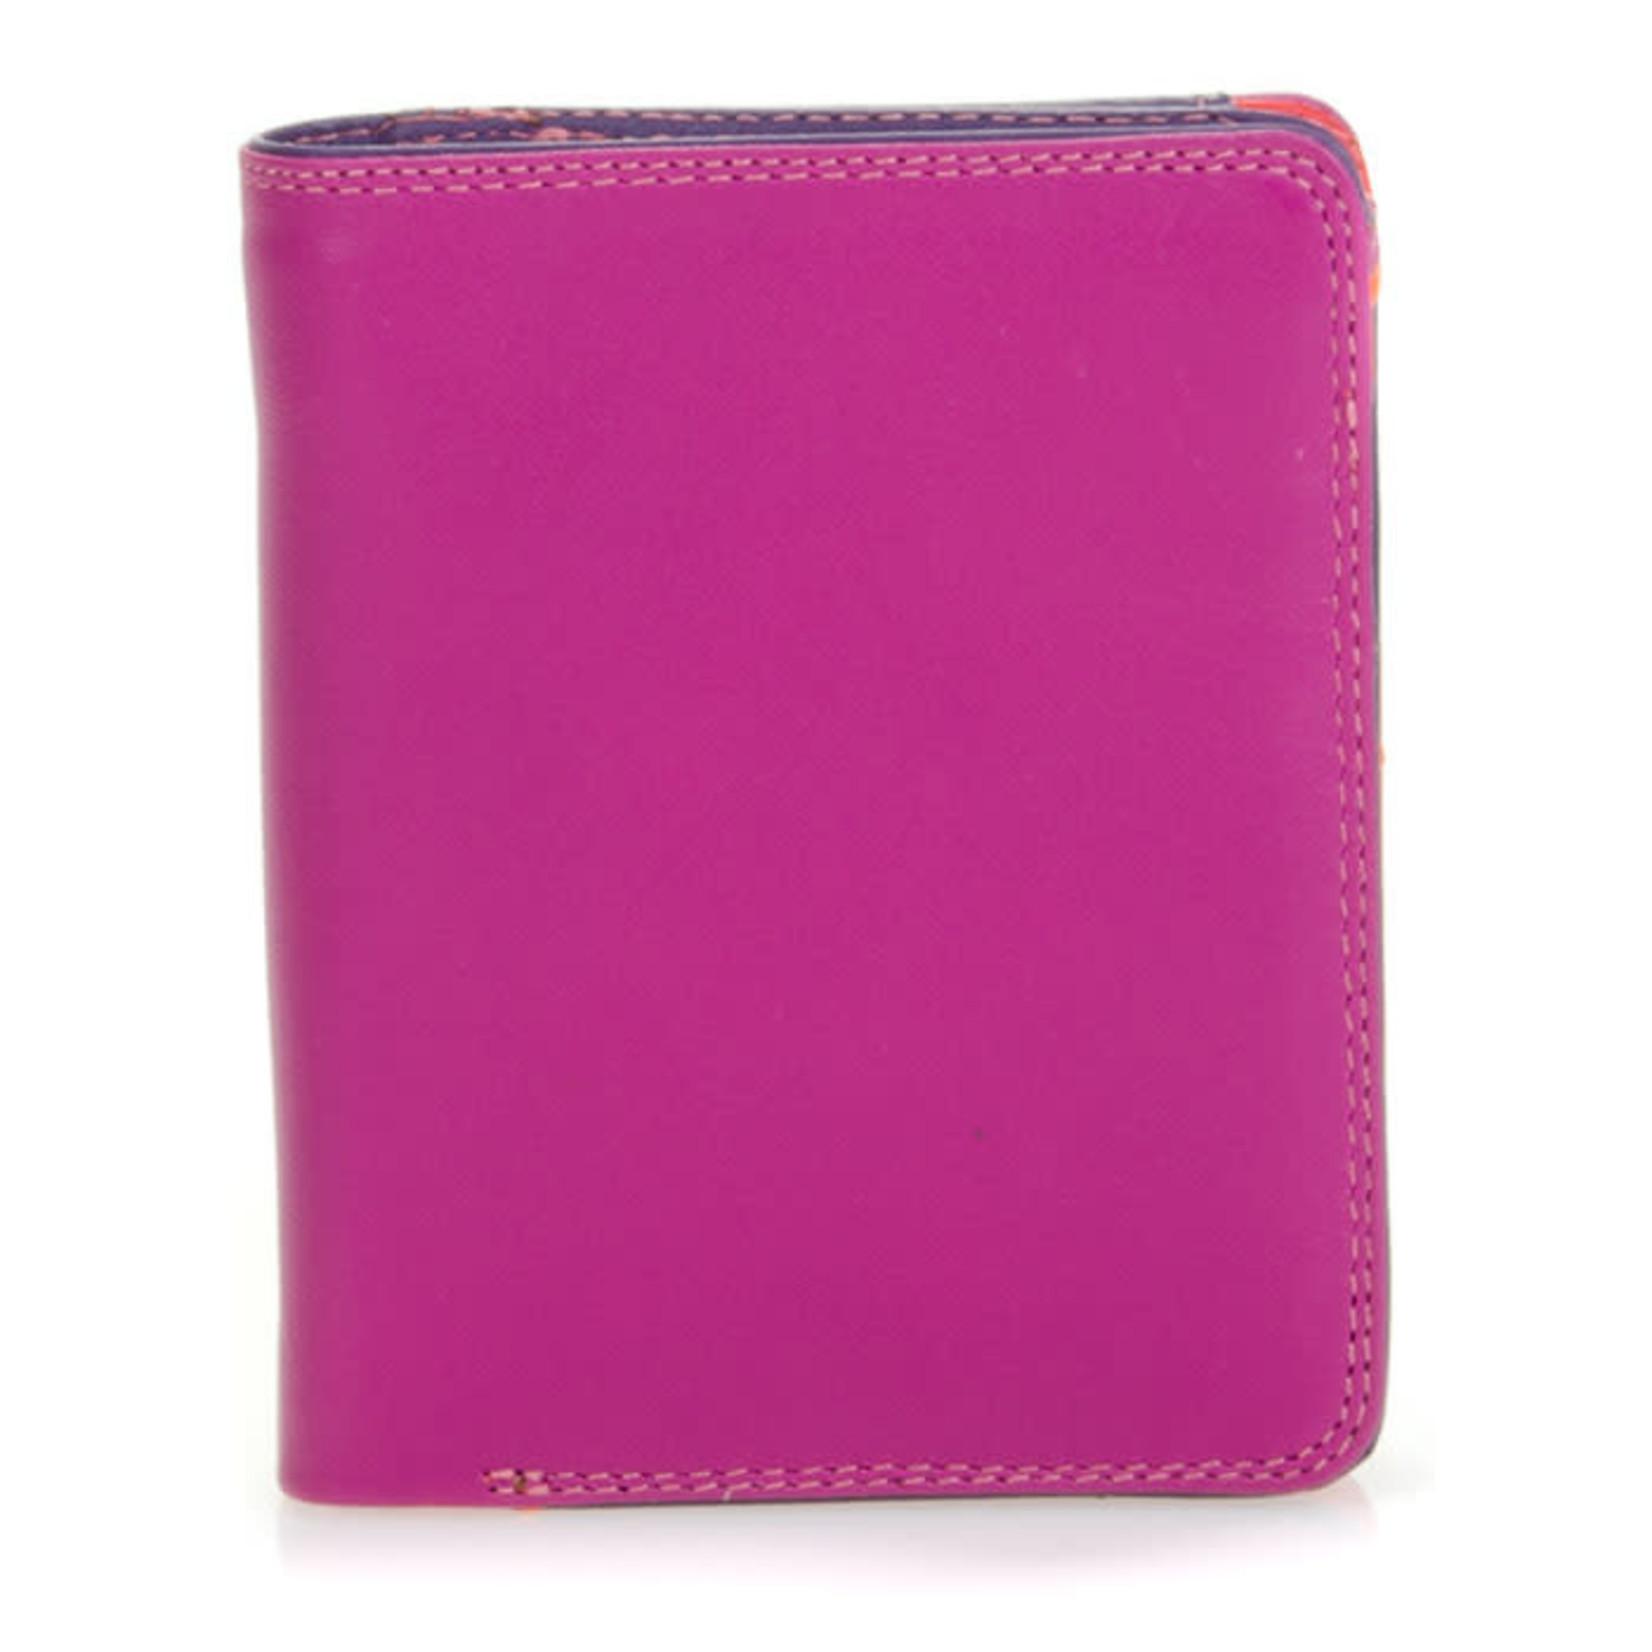 MyWalit Medium Wallet w/Zip Around Purse Sangria Multi